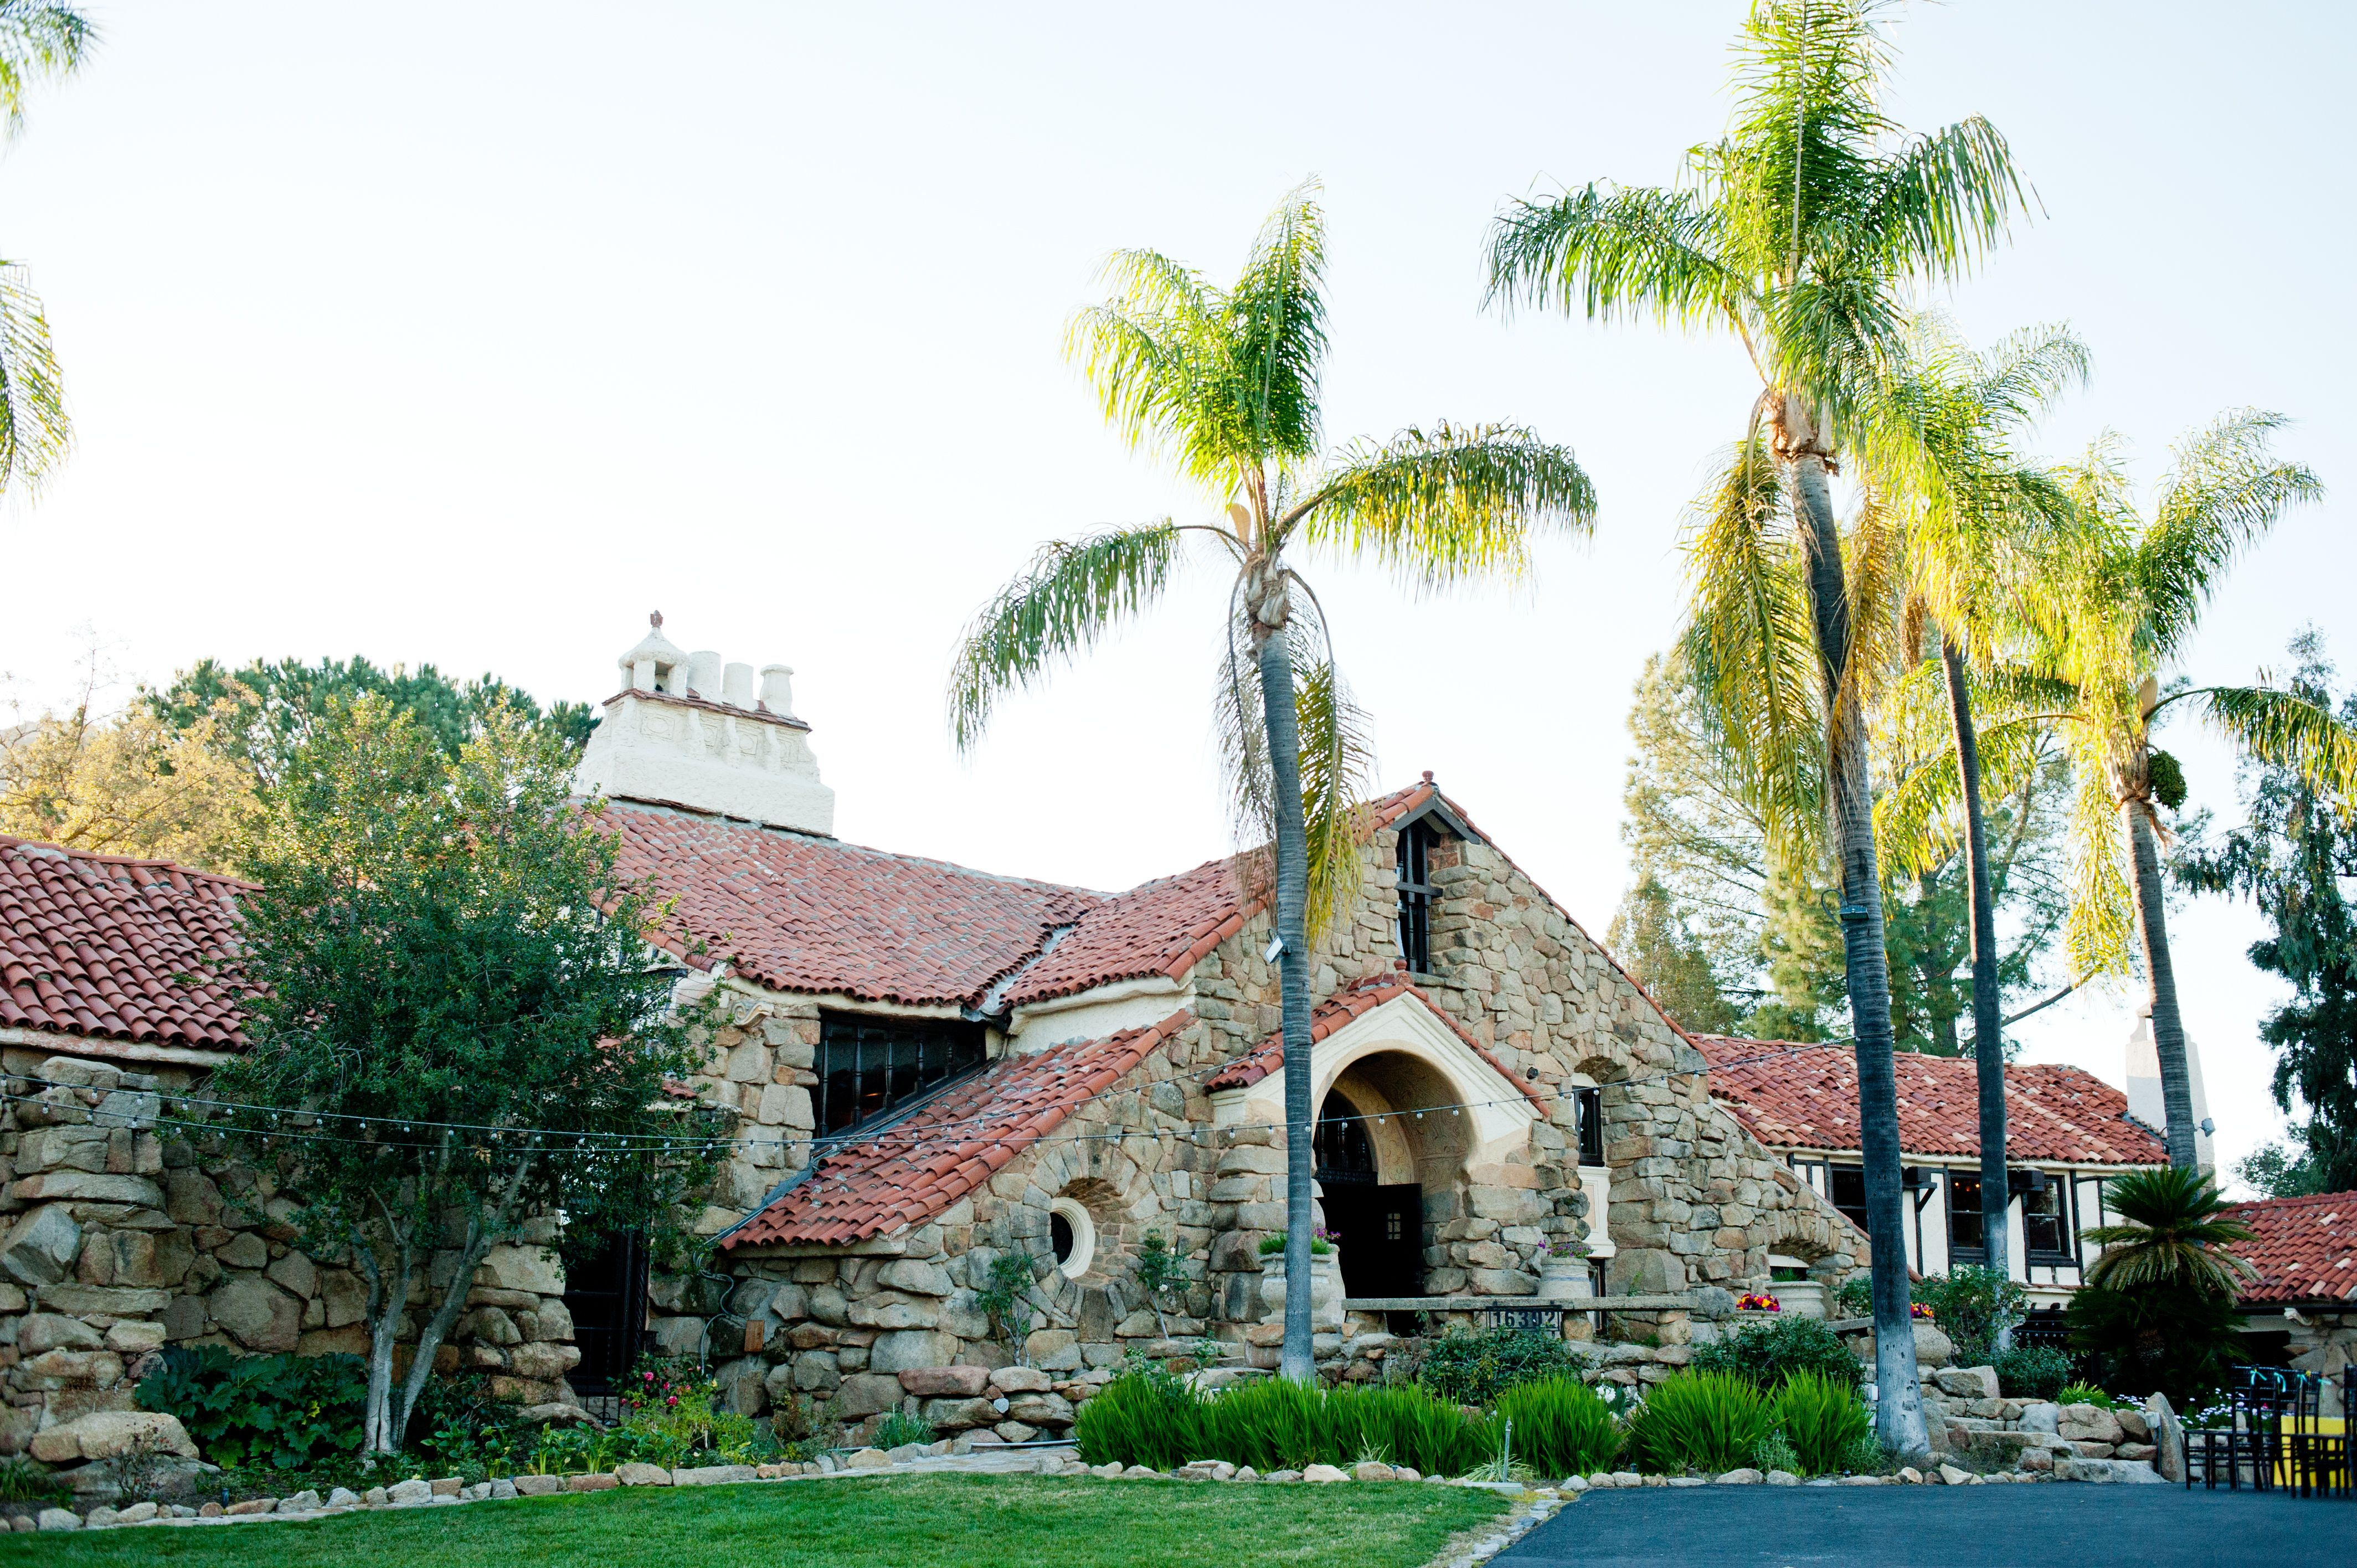 Mt. Woodson Castle San Diego, CA Wedding and Reception